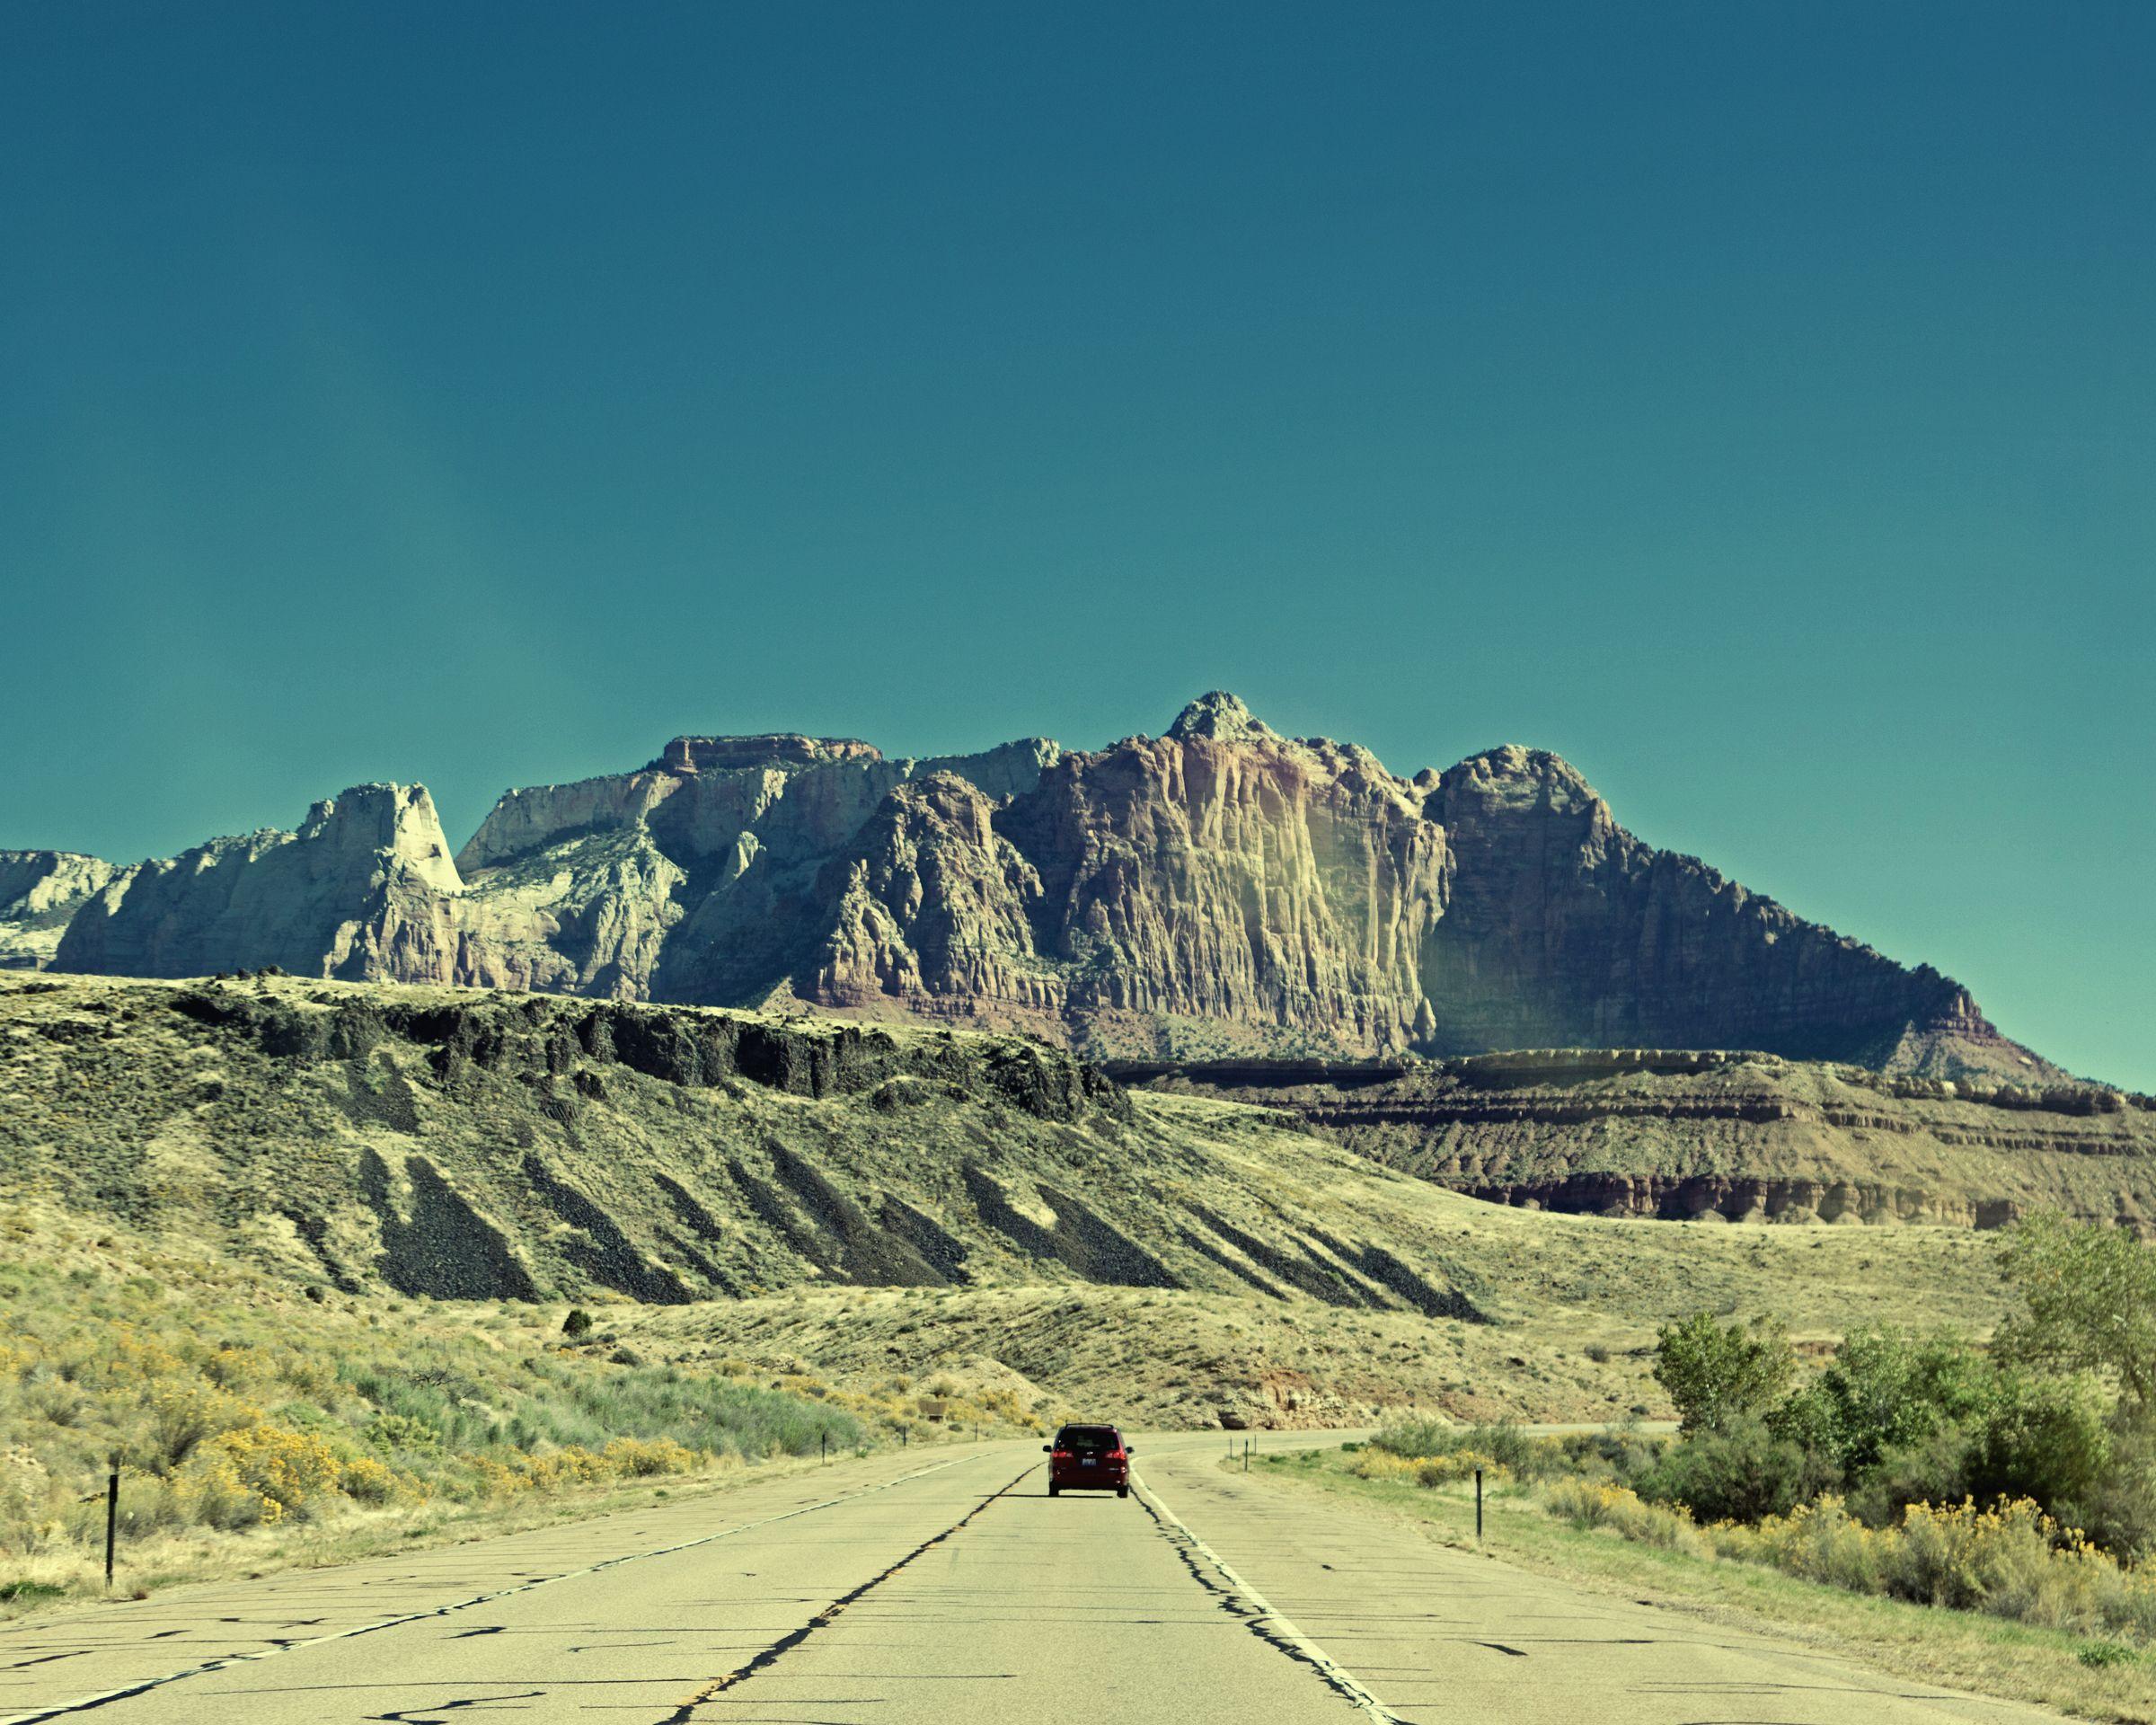 The road in SW Utah.